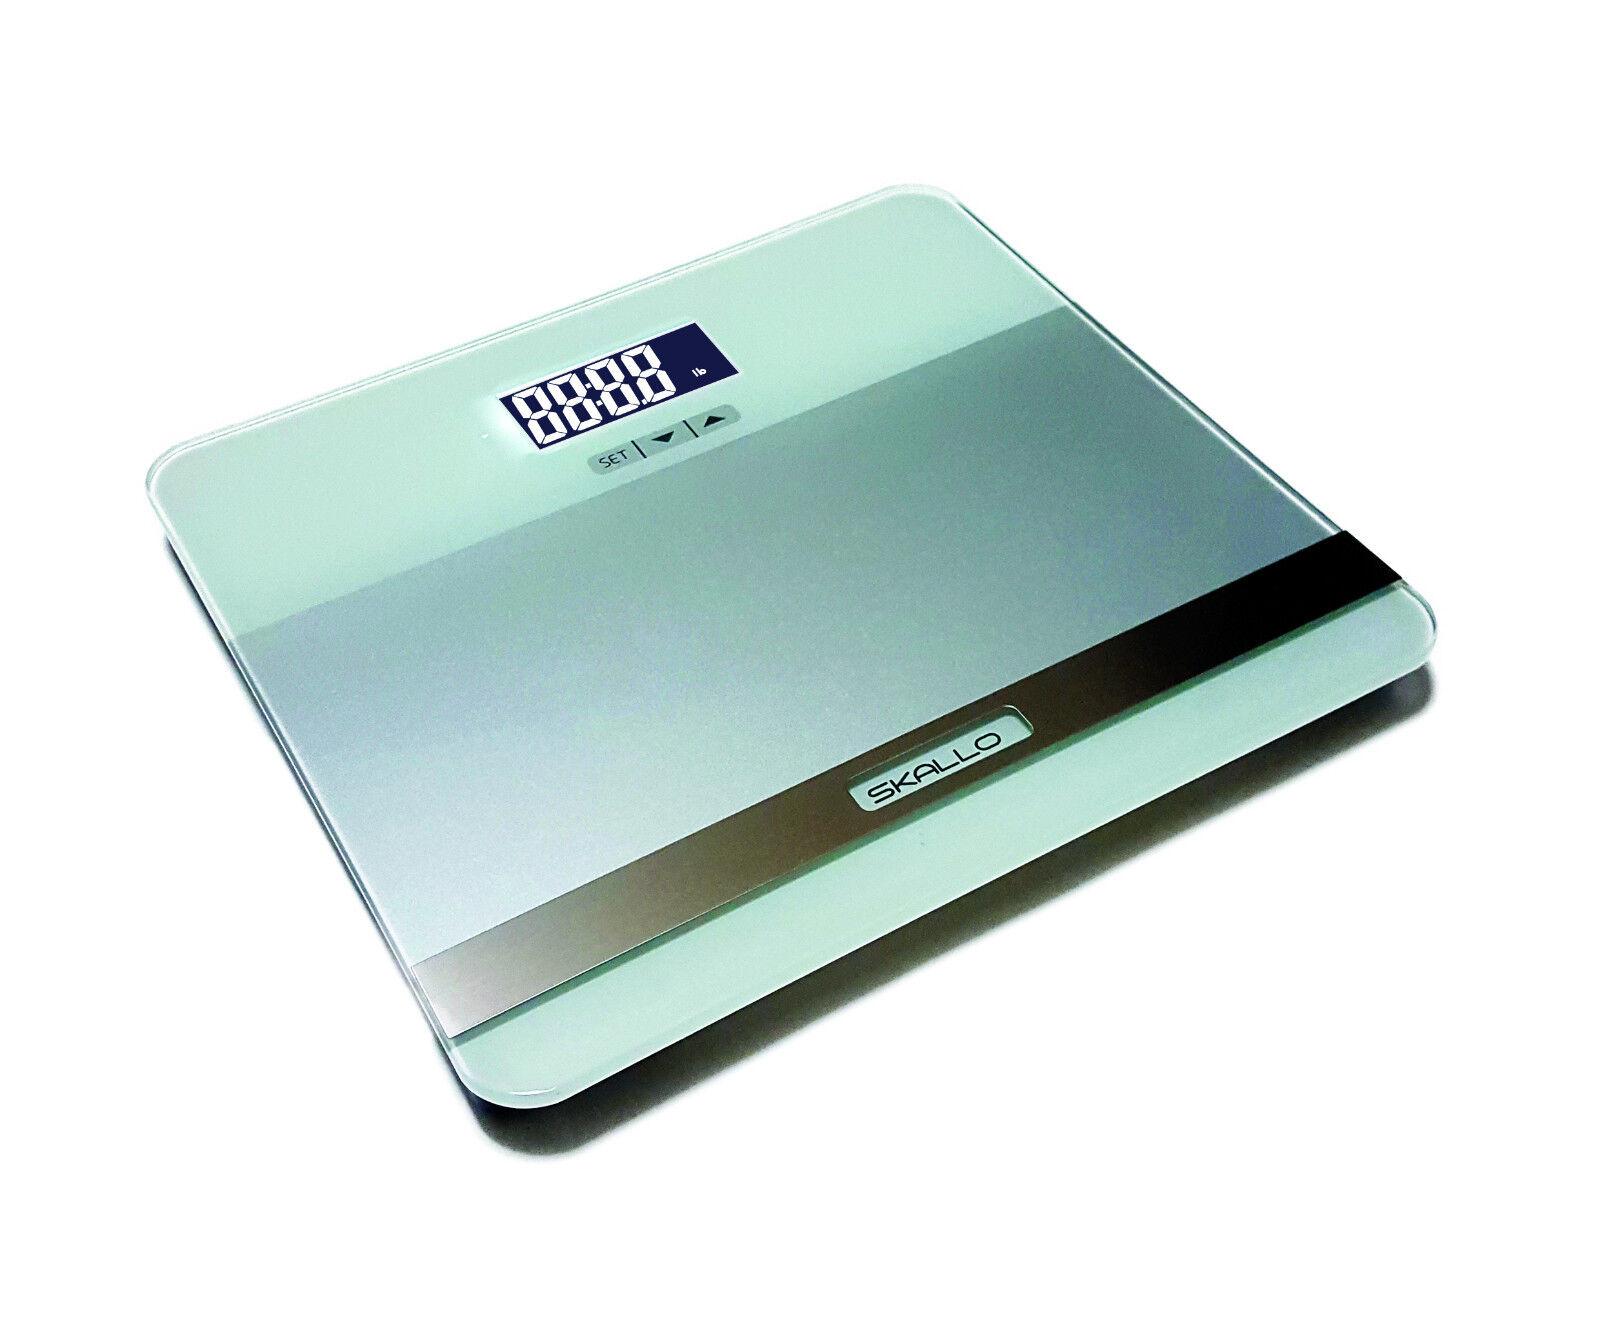 Skallo 440lbs LCD Digital Bathroom Body Fat Weight Scale Hydration Muscle BMI S